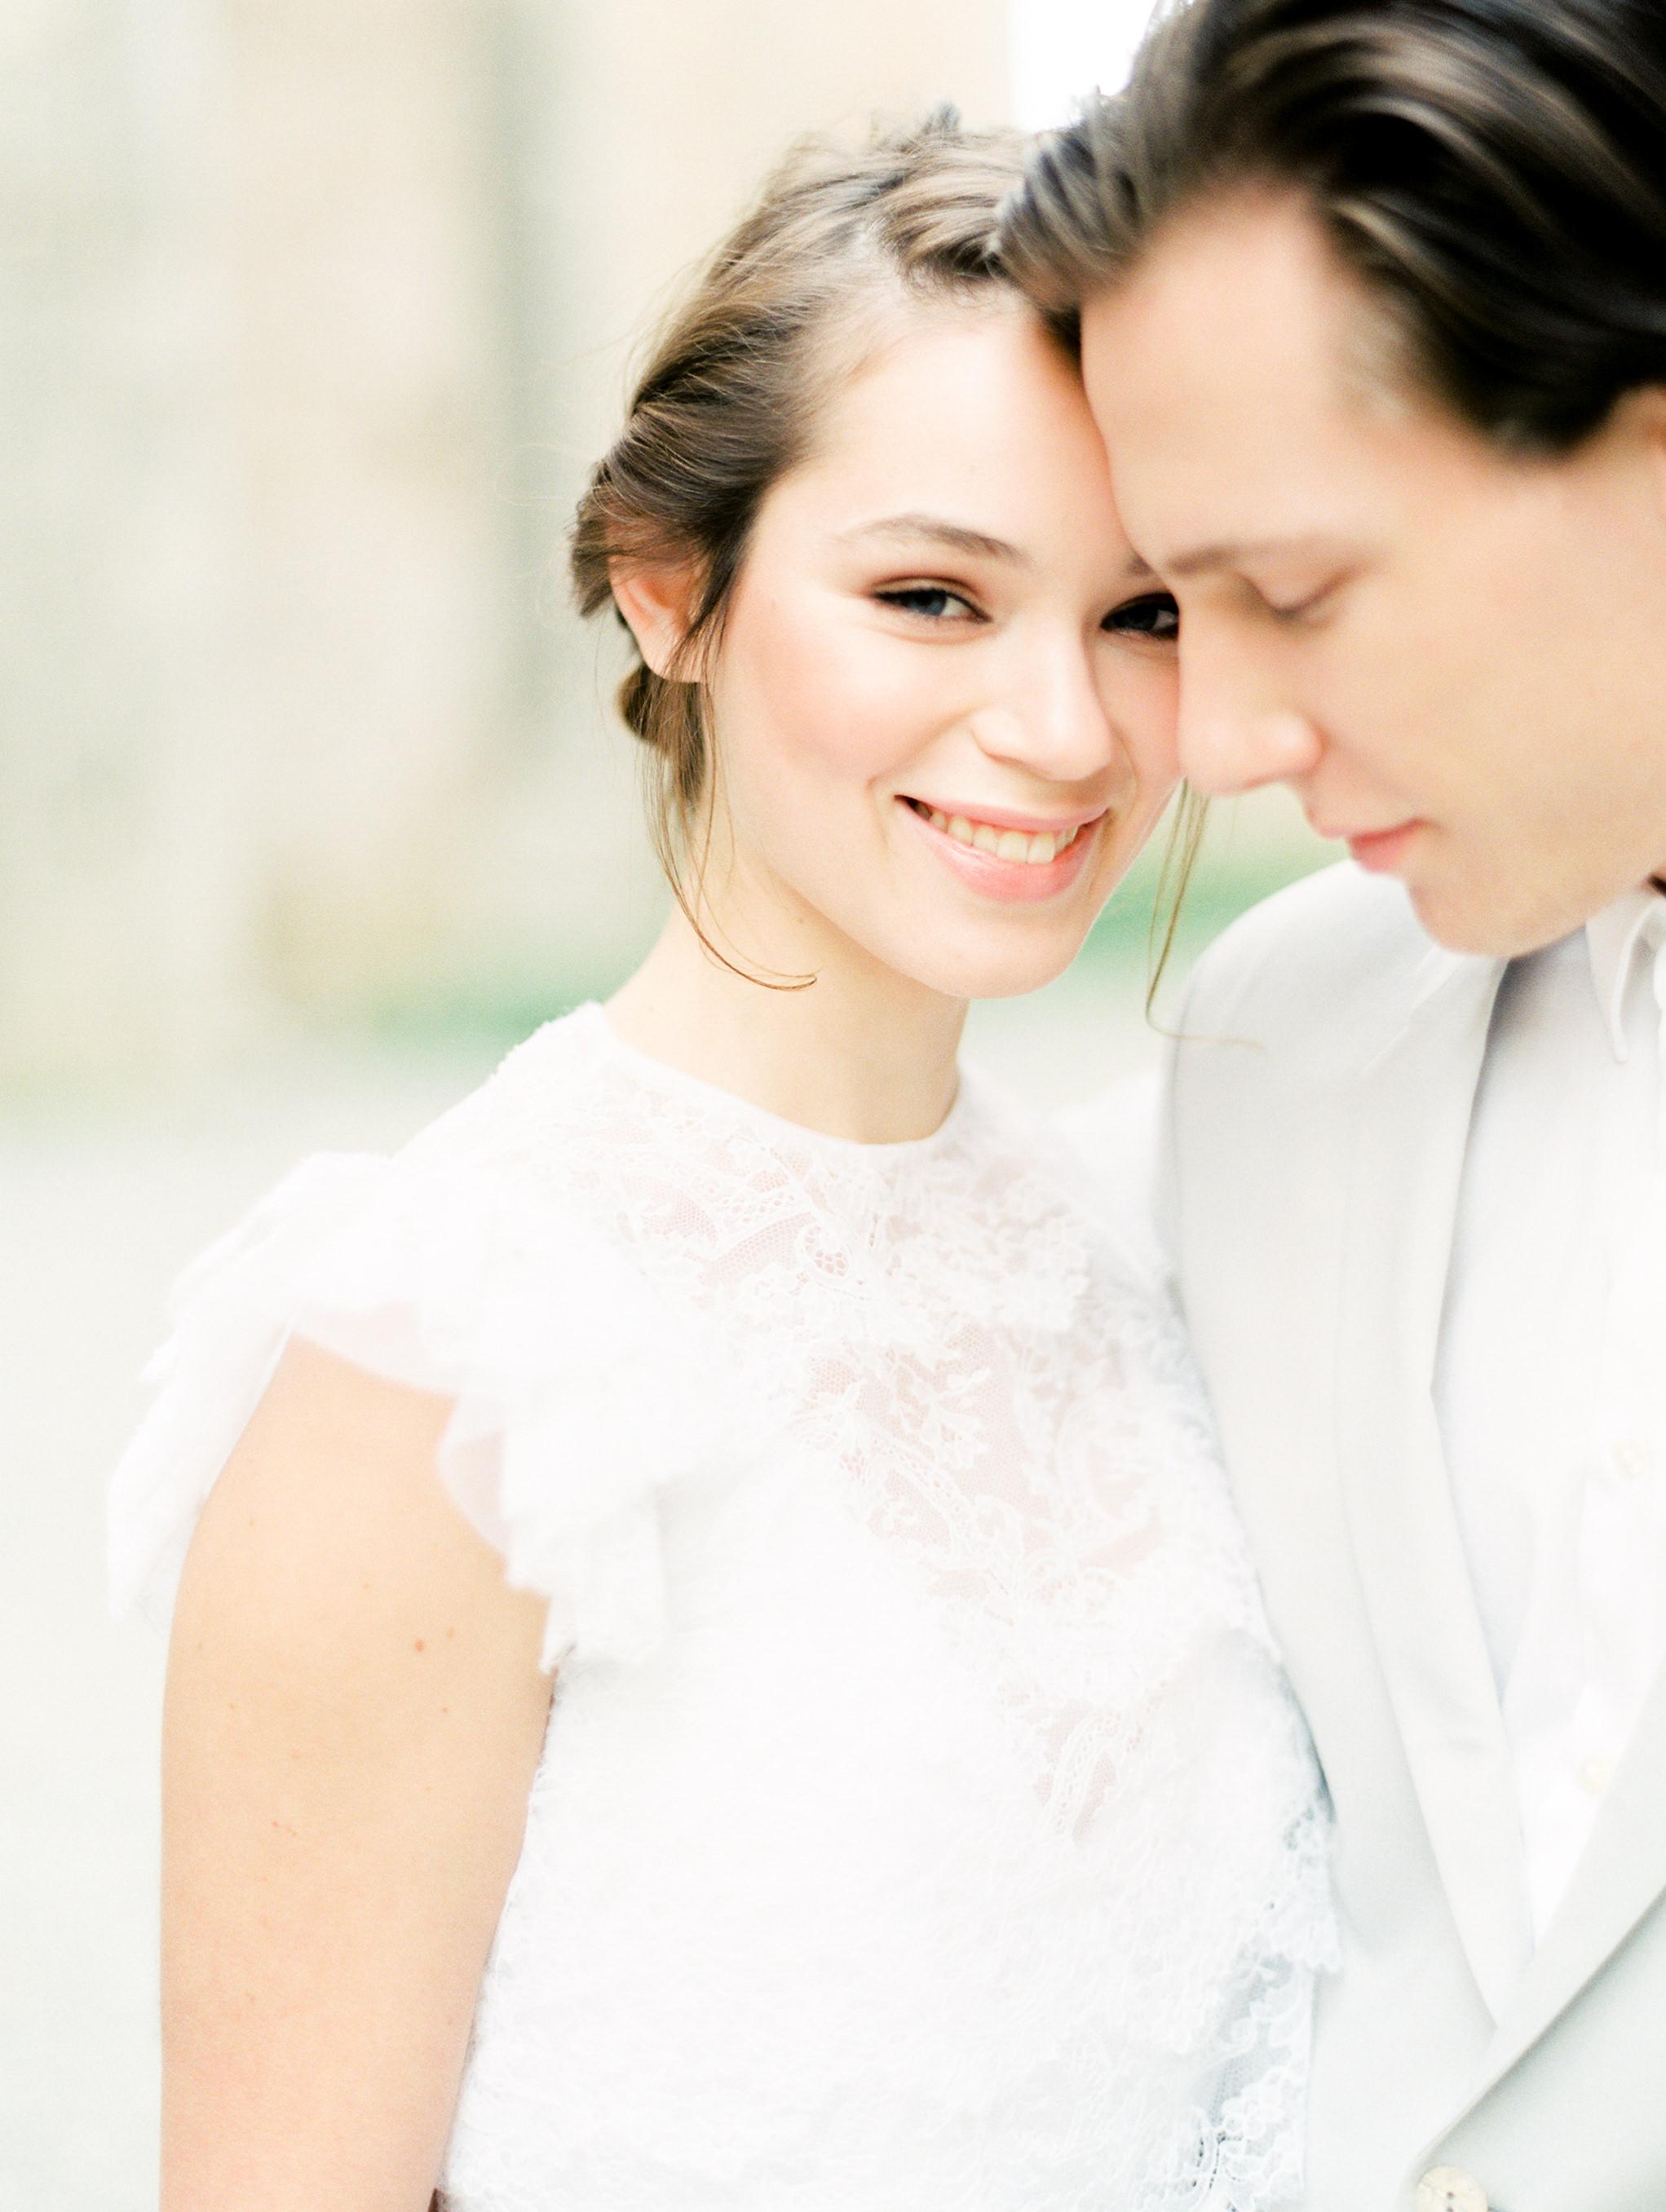 romantic-italy-wedding-in-tuscany-3.jpg